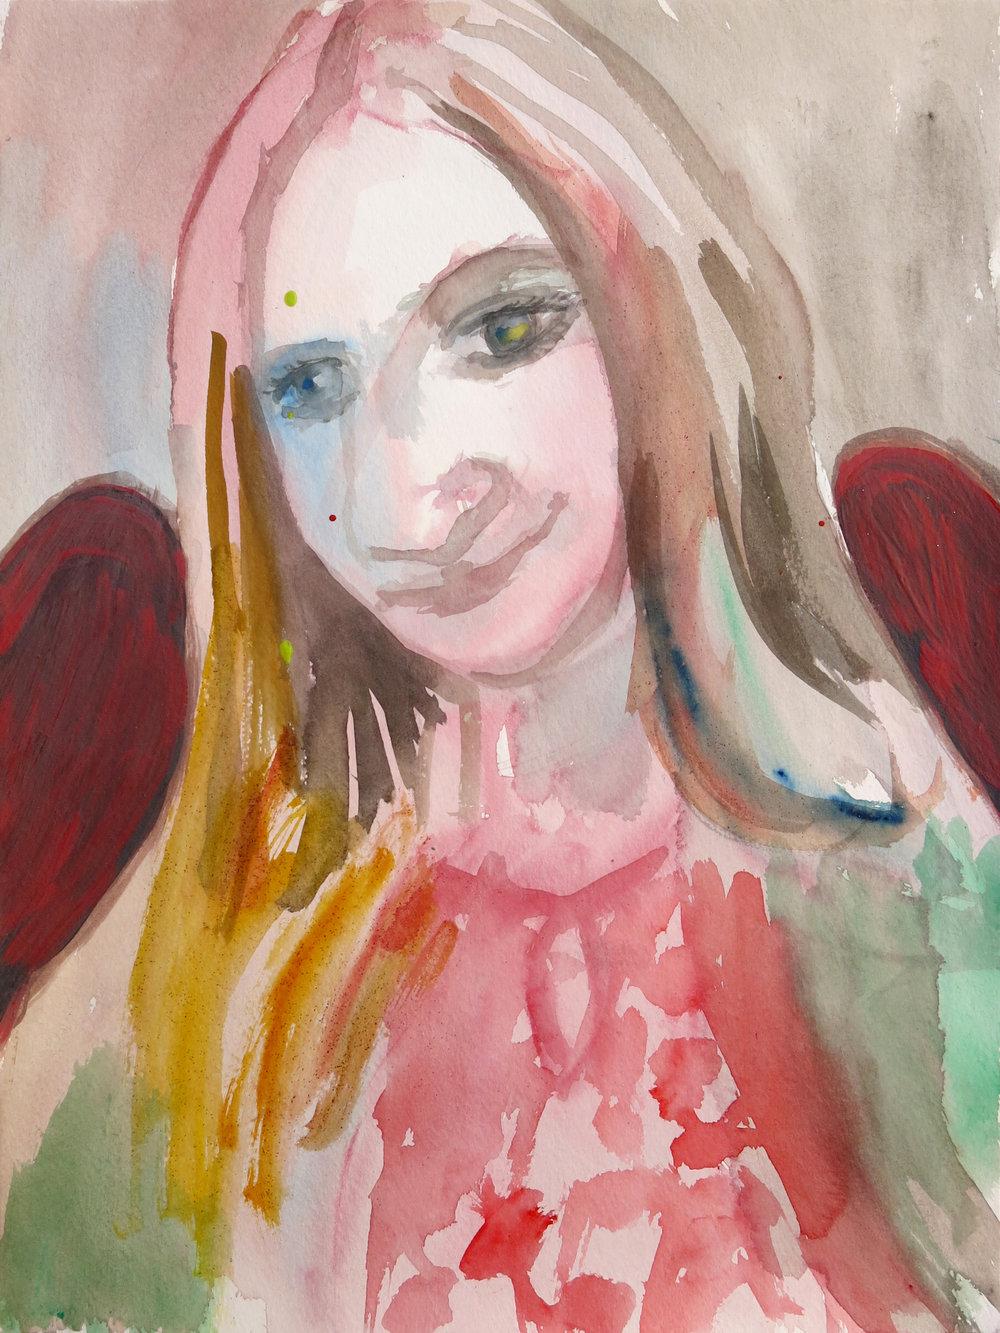 Barbra Streisand Portrait #116